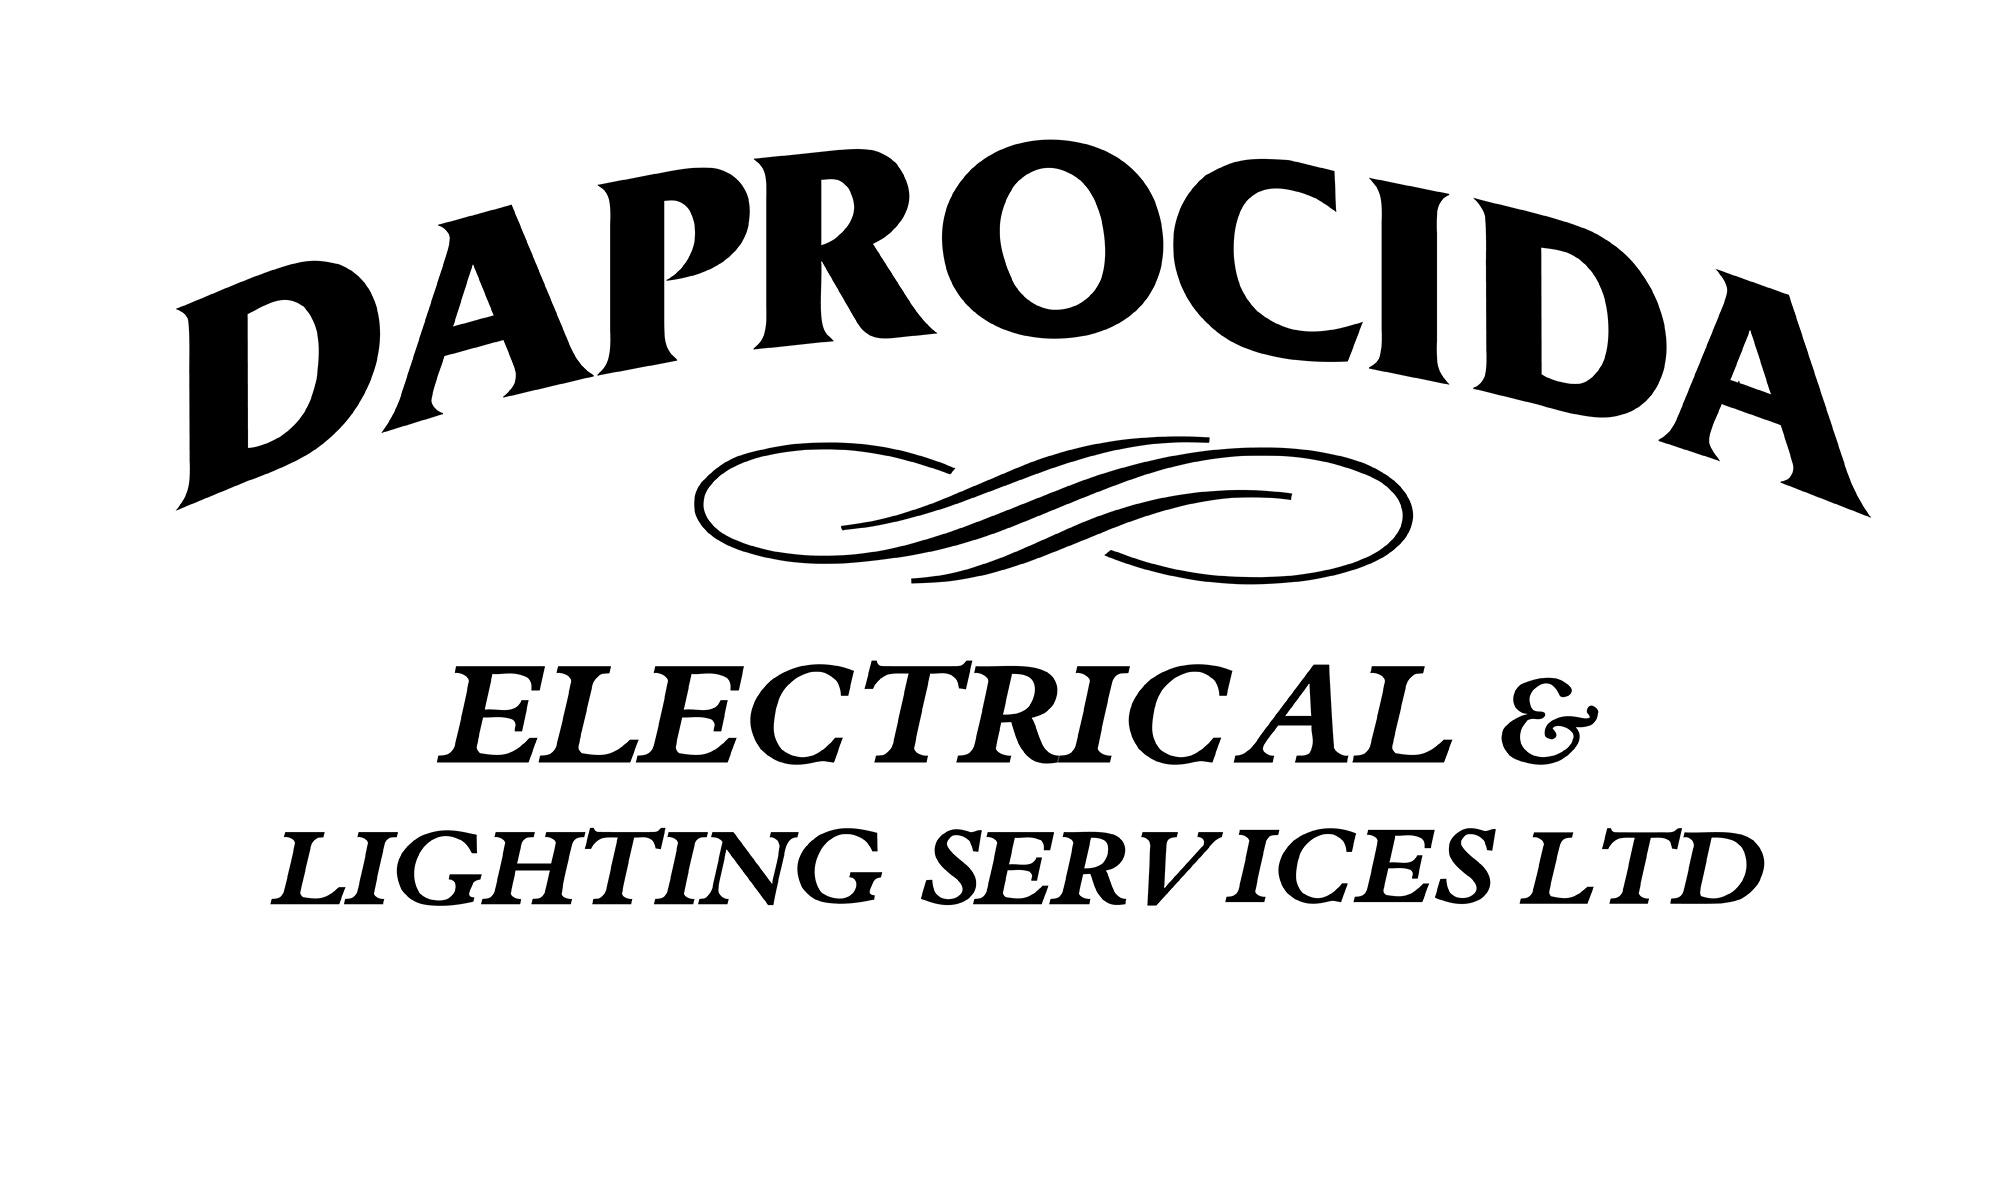 Daprocida Electrical